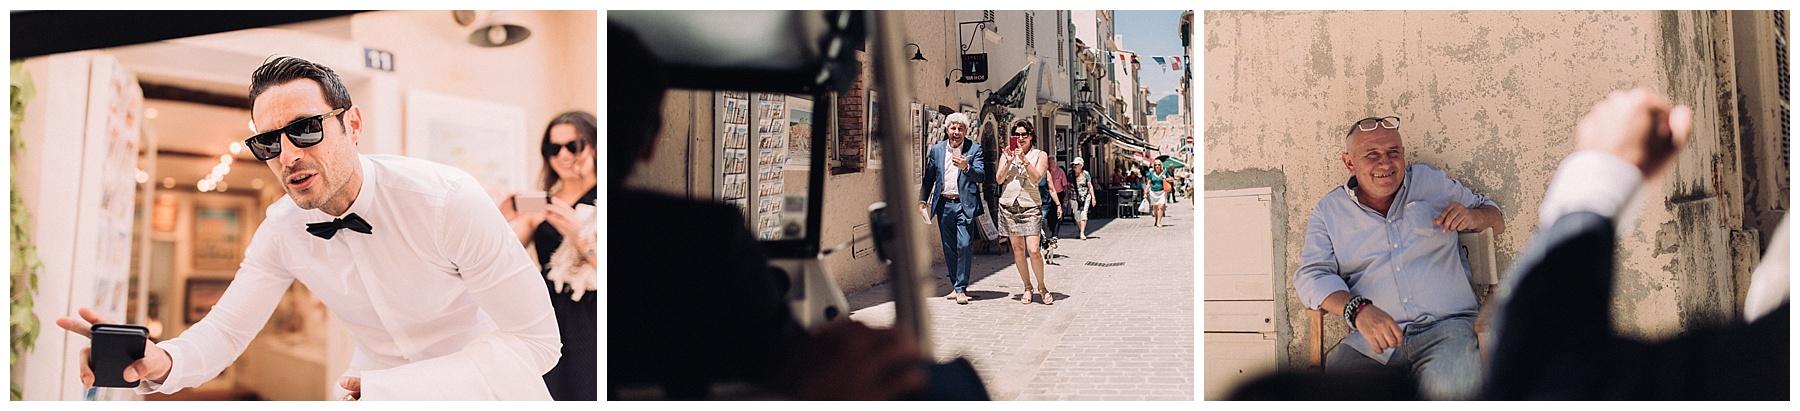 Mariage Saint Tropez